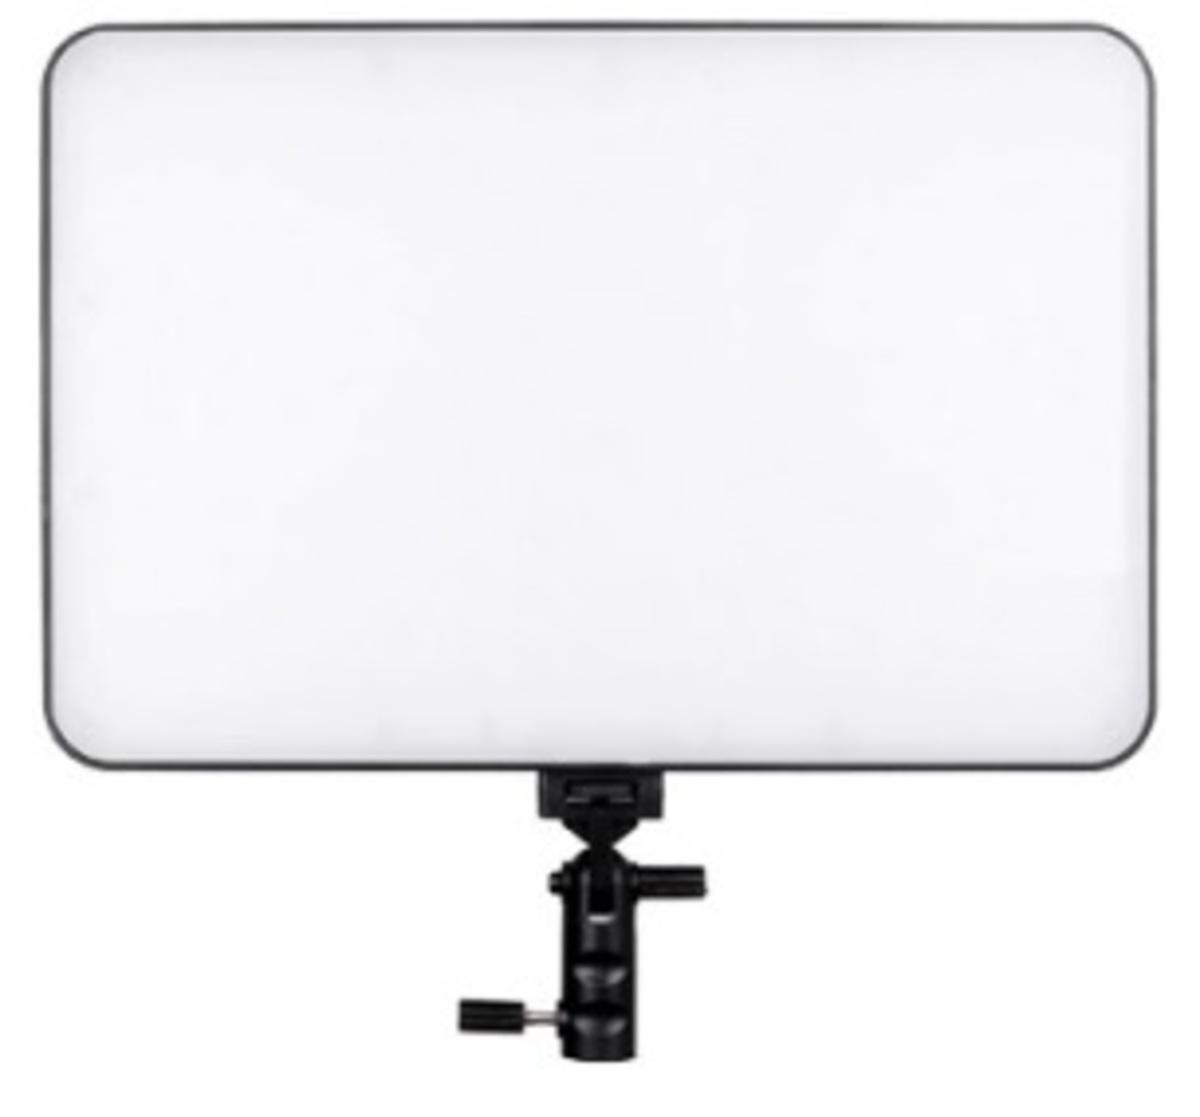 Viltrox VL-400 柔光系列超薄LED攝影燈